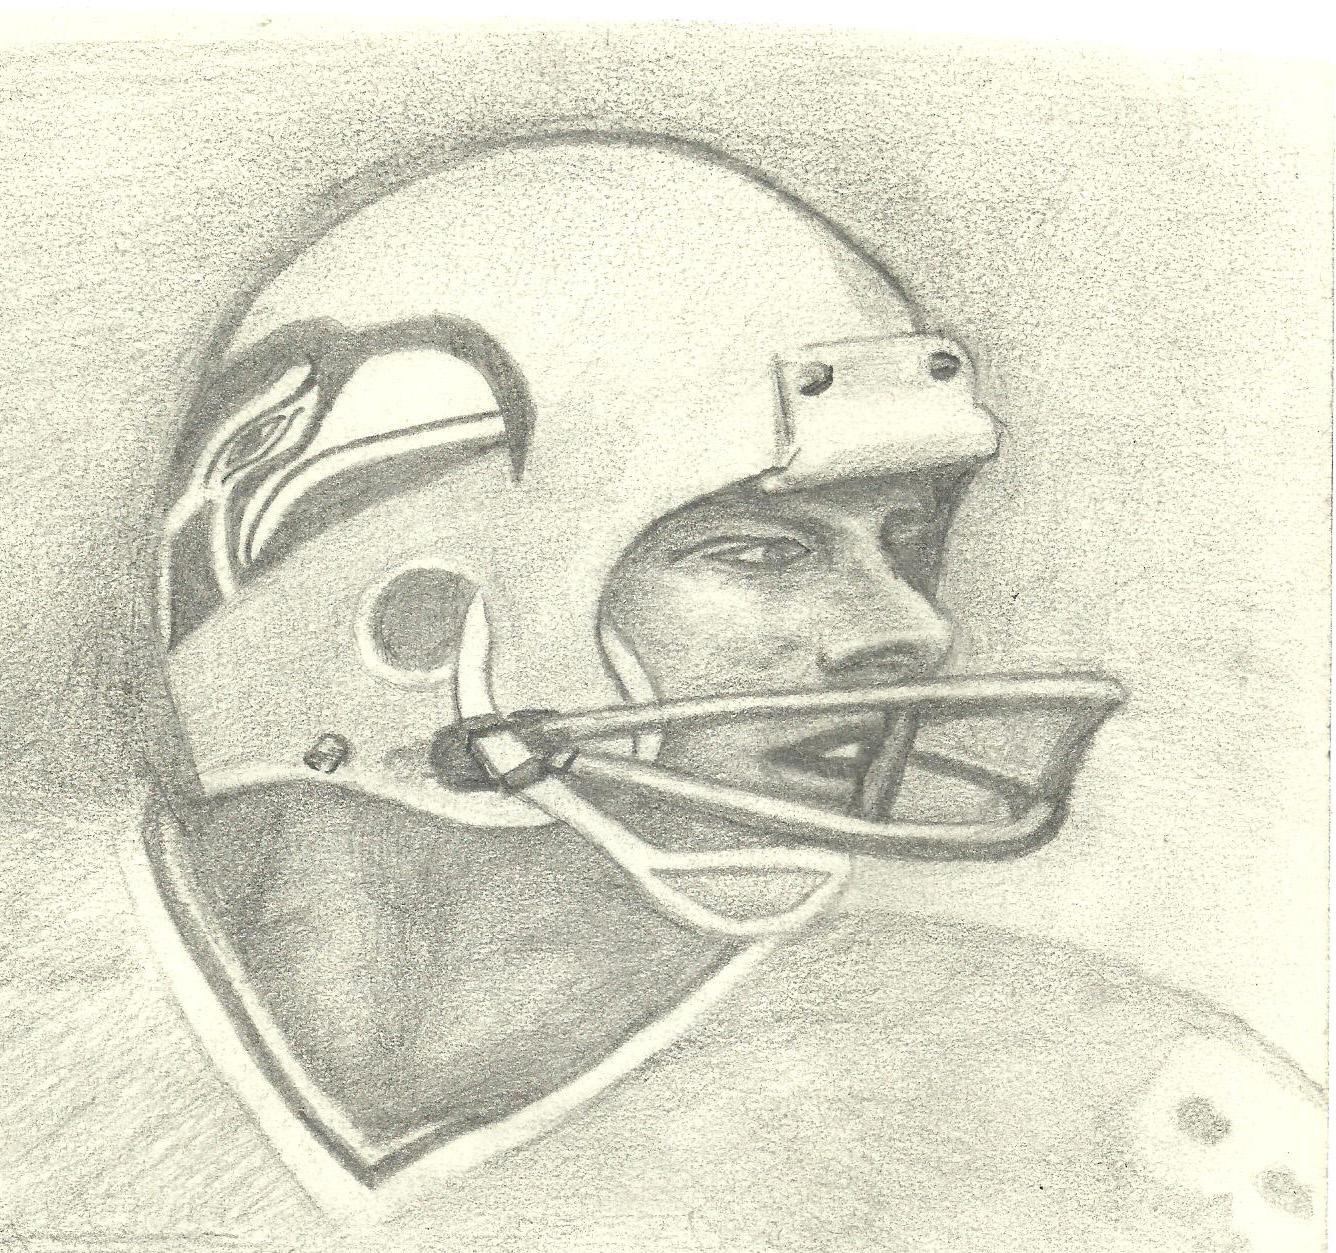 Steve Largent Sketch 001 by michaelmiller363